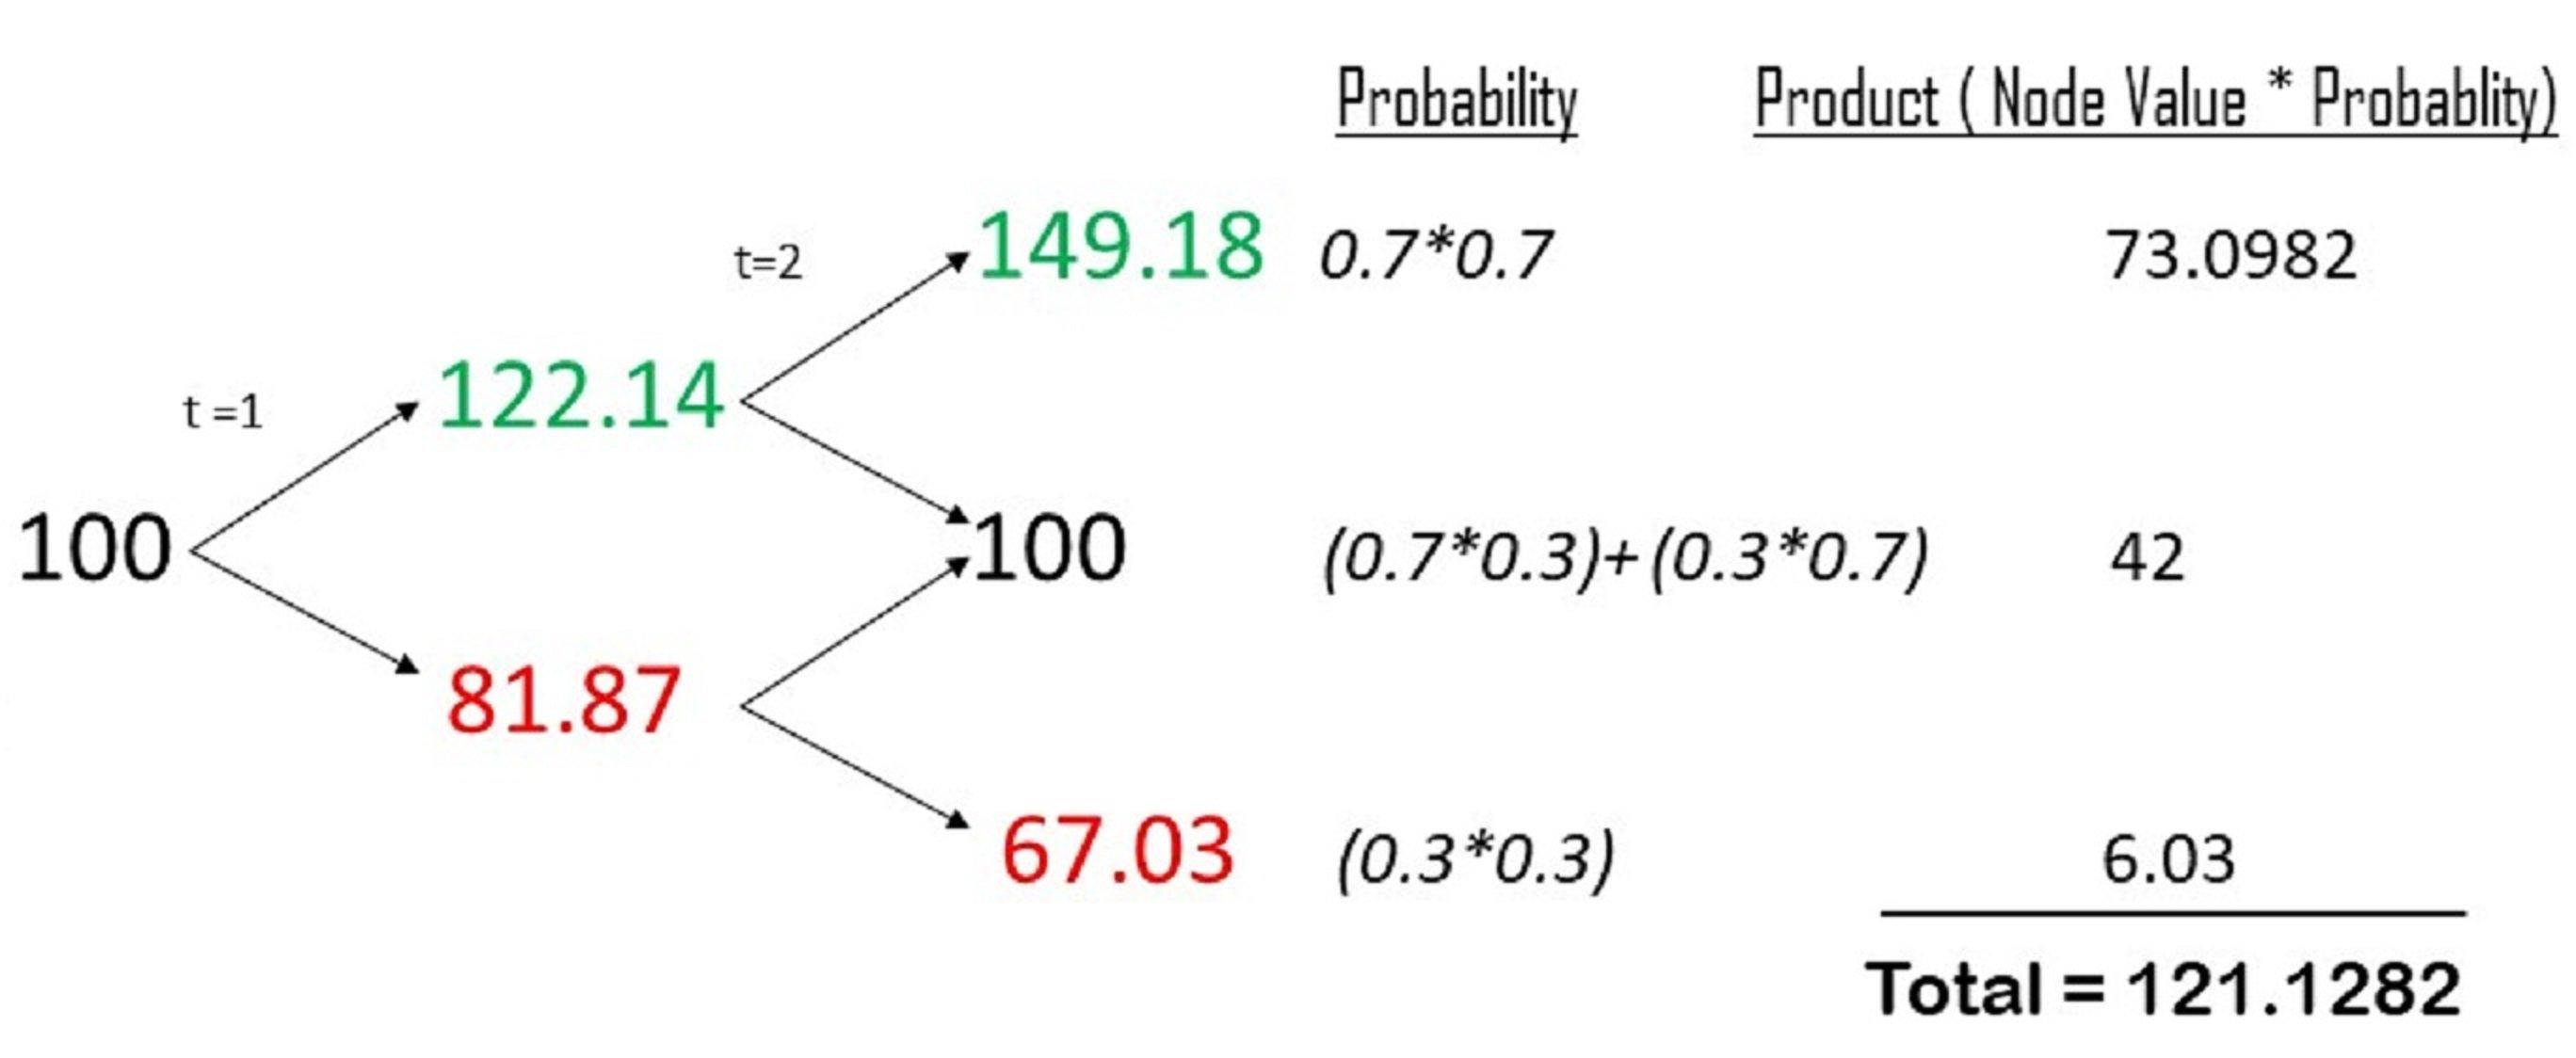 Option Pricing Models - Binomial Multi-period Model Example